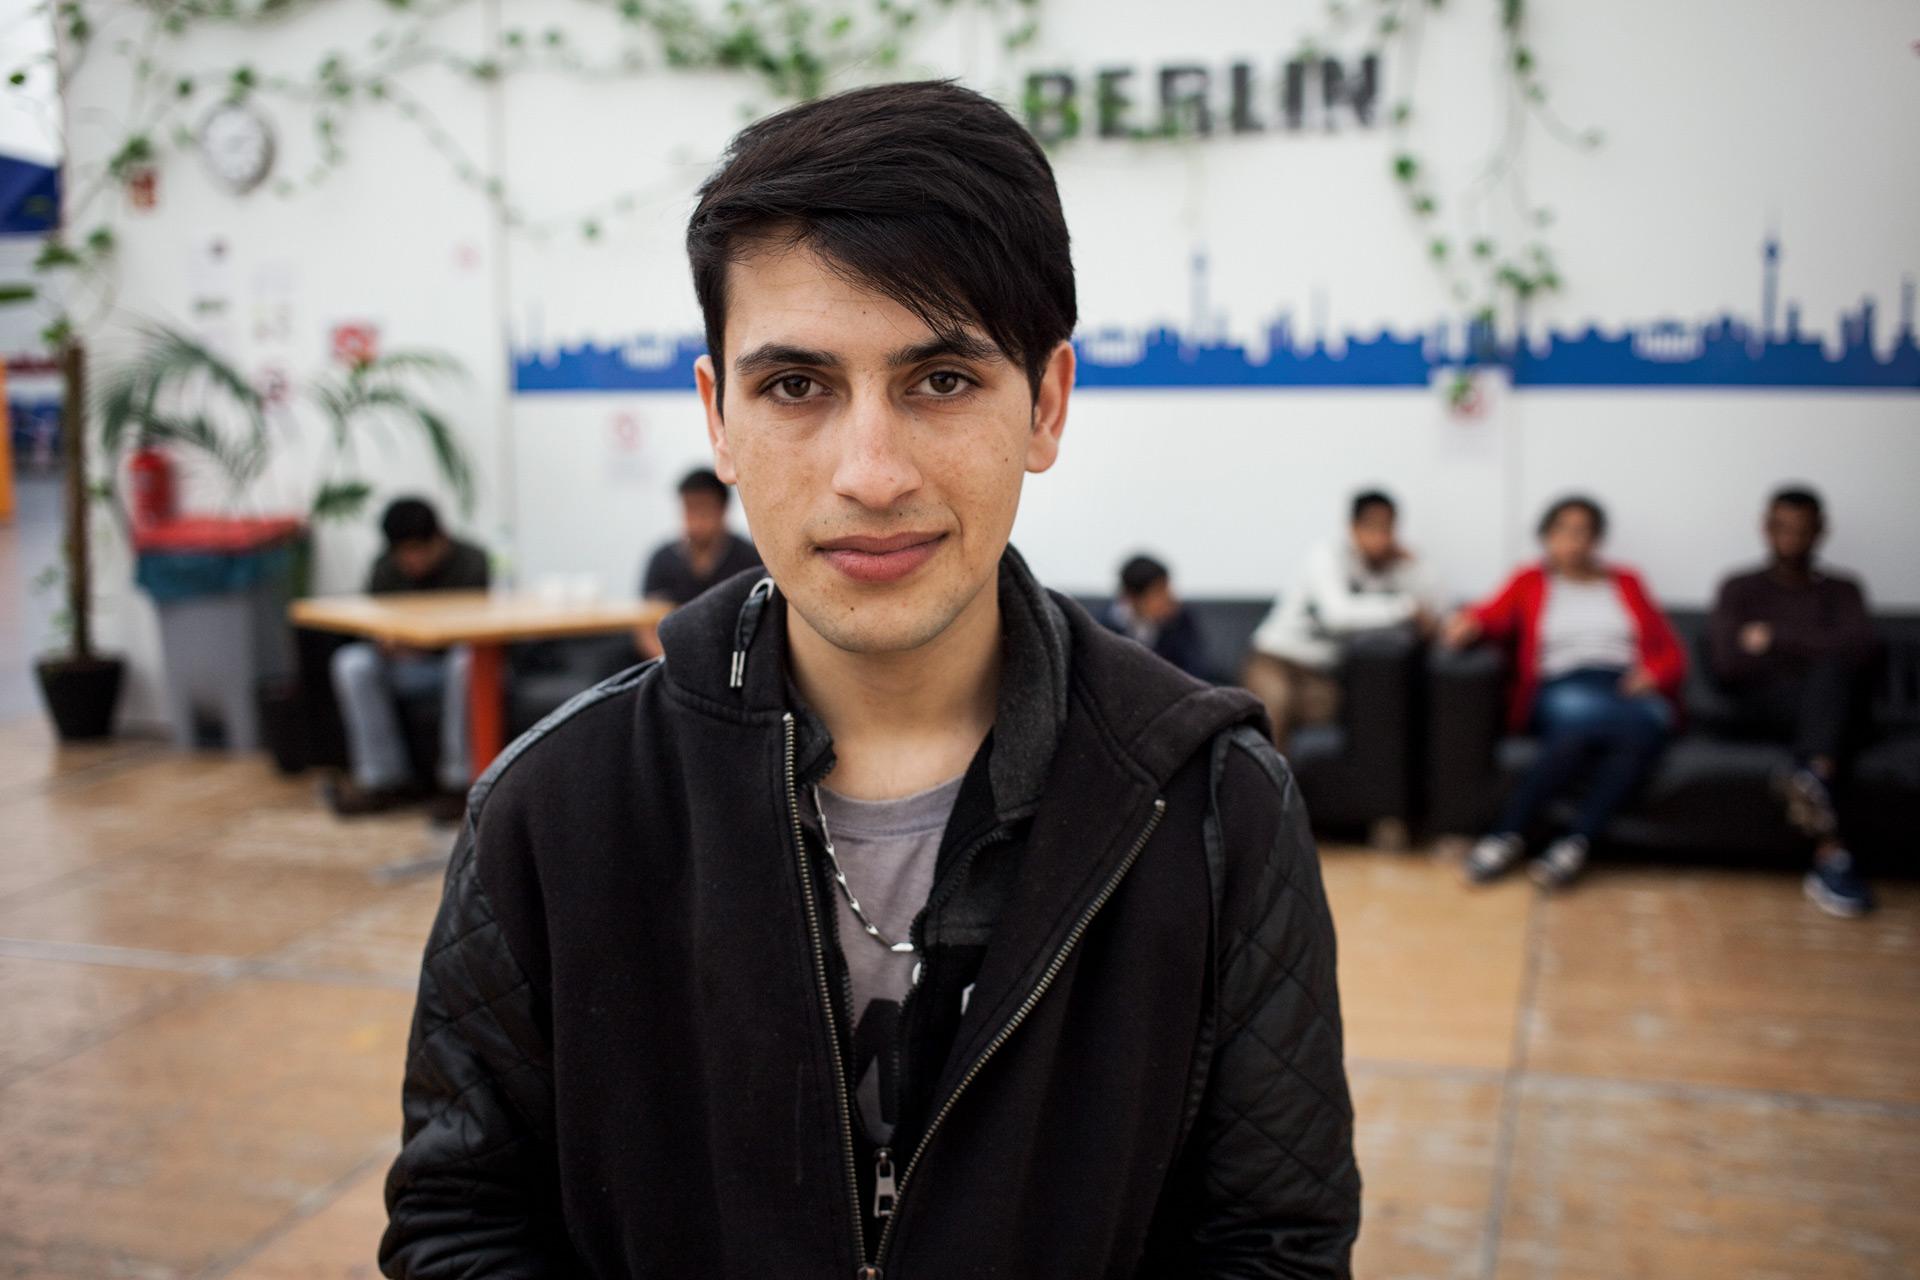 timo-stammberger-photography-fluechtlinge-refugees-berlin-migration-notunterkunft_03